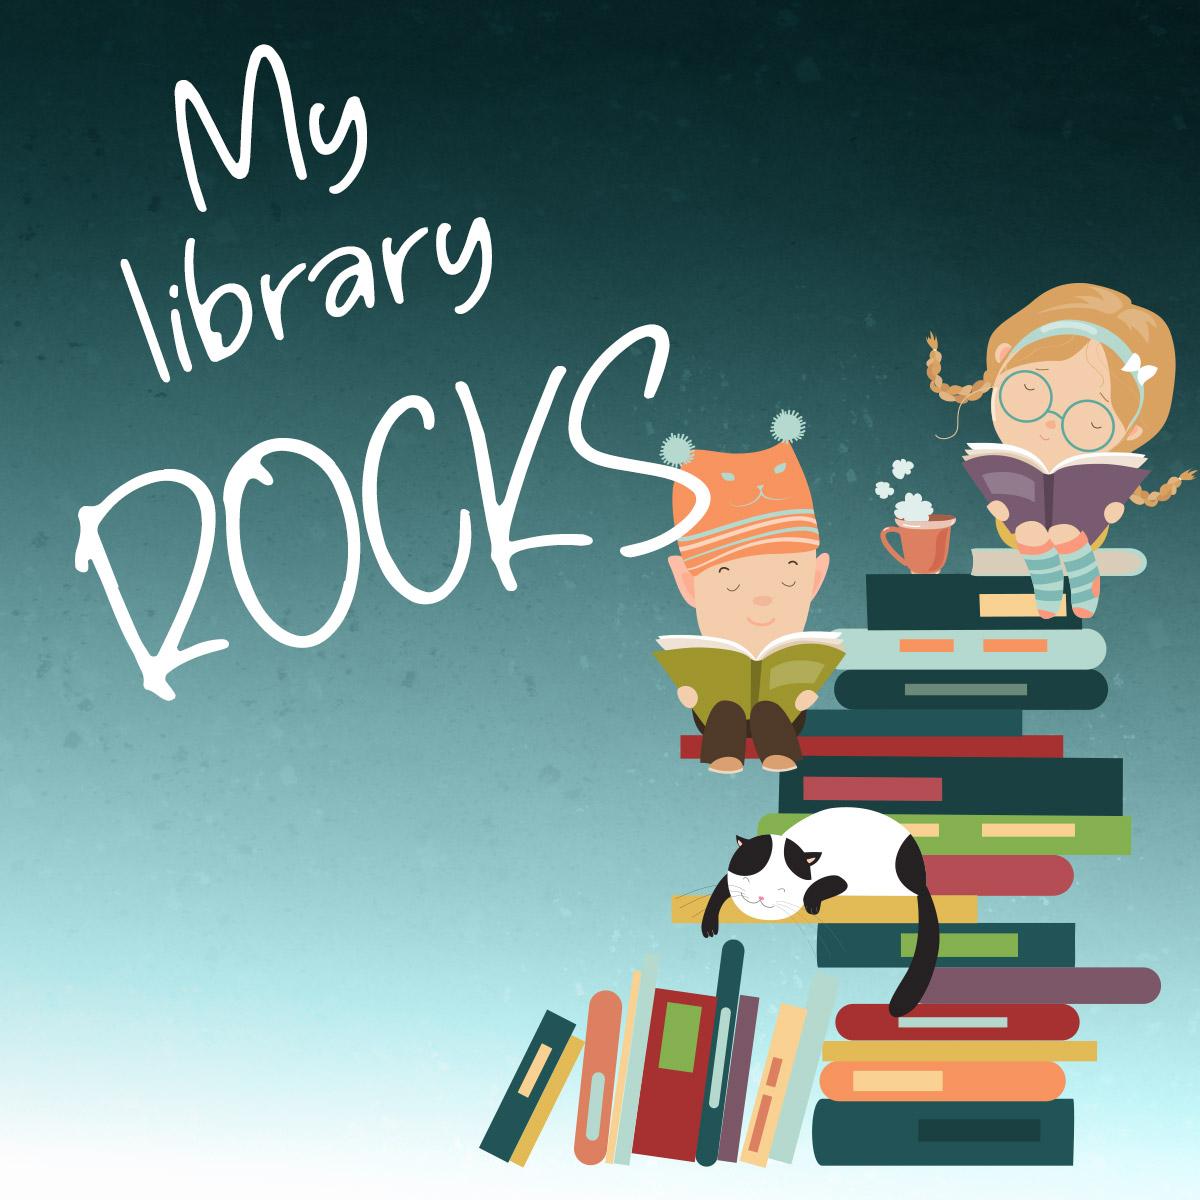 My Library Rocks